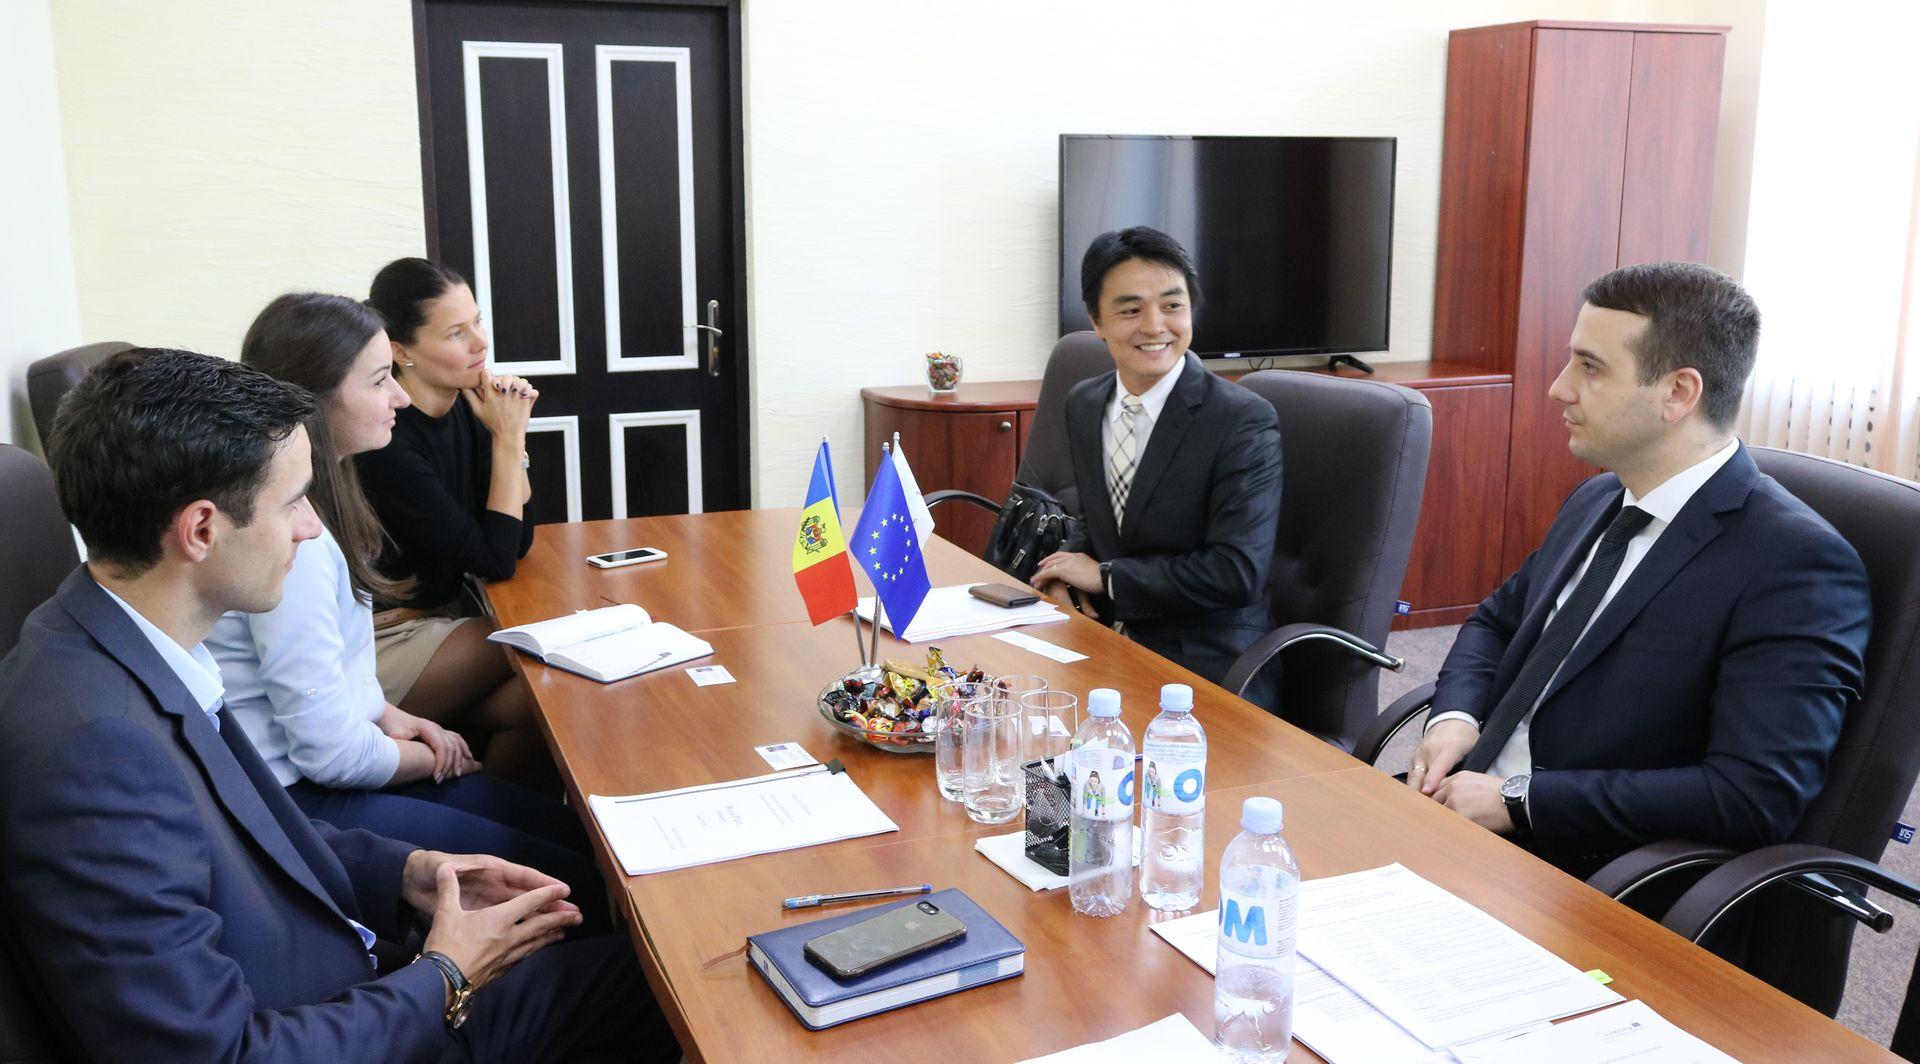 Japonia va continua să ofere suport antreprenorilor moldoveni